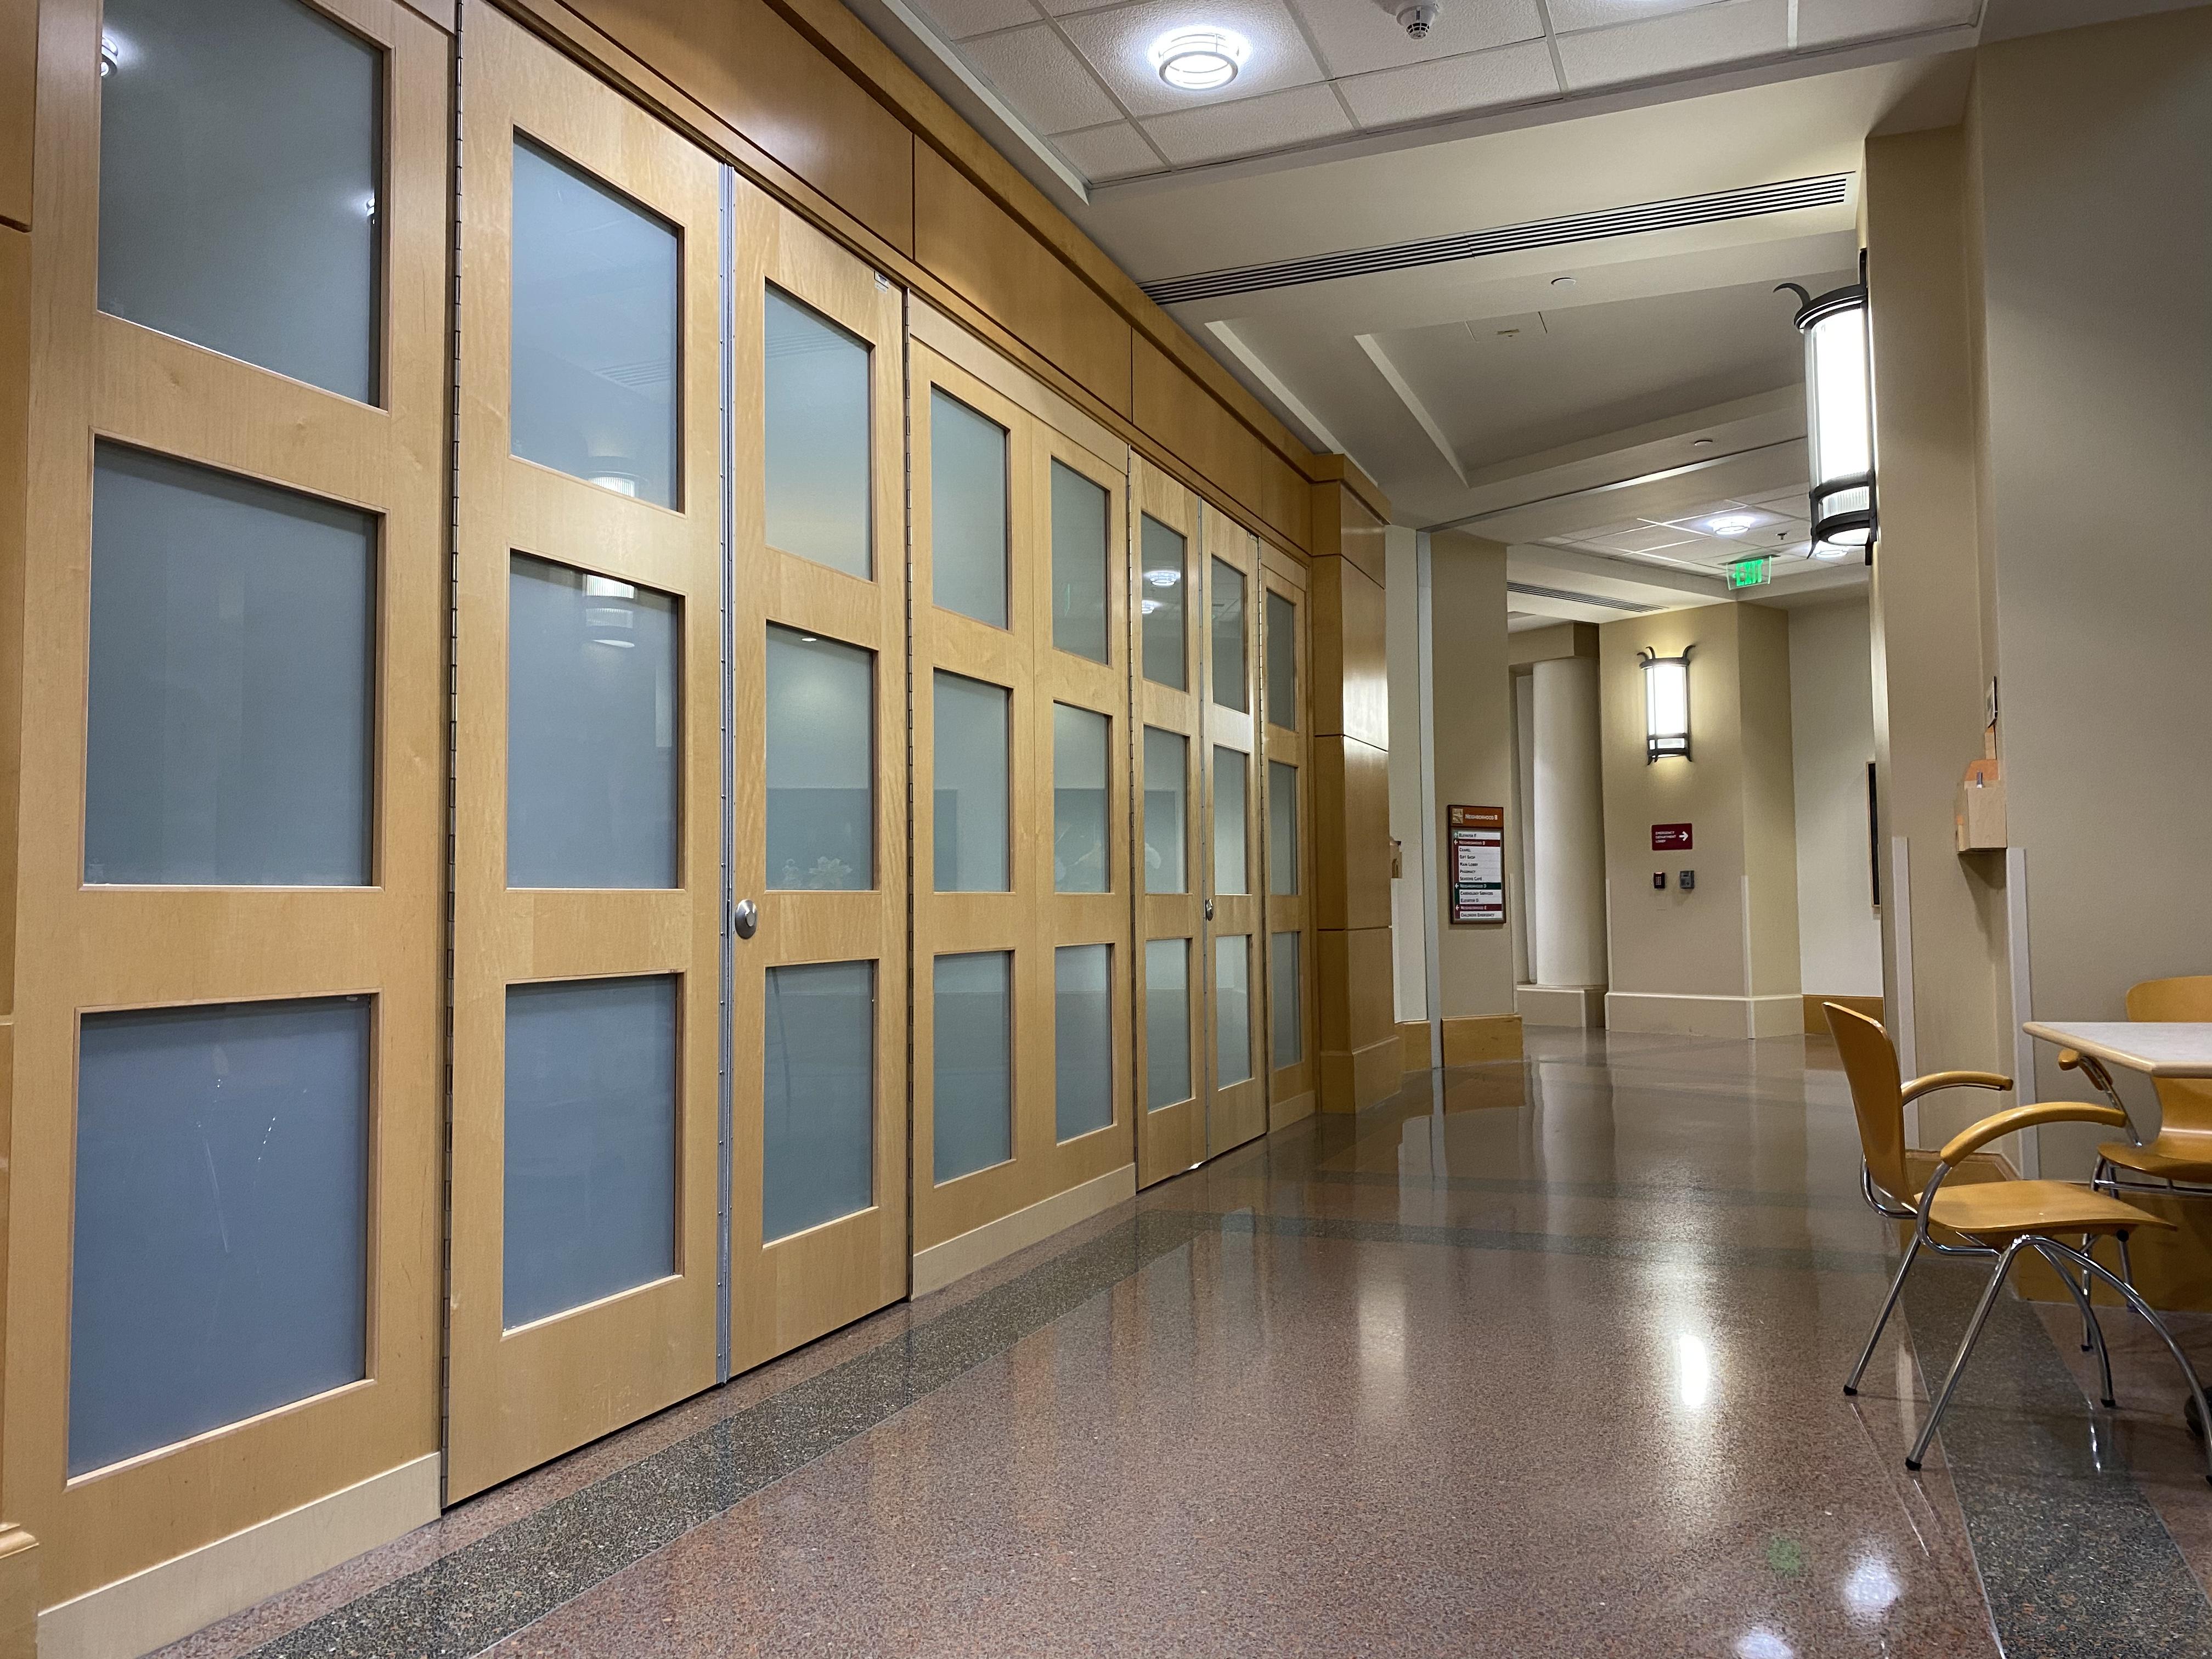 3M Decorative Window Film in Offices installed in Orlando, Florida